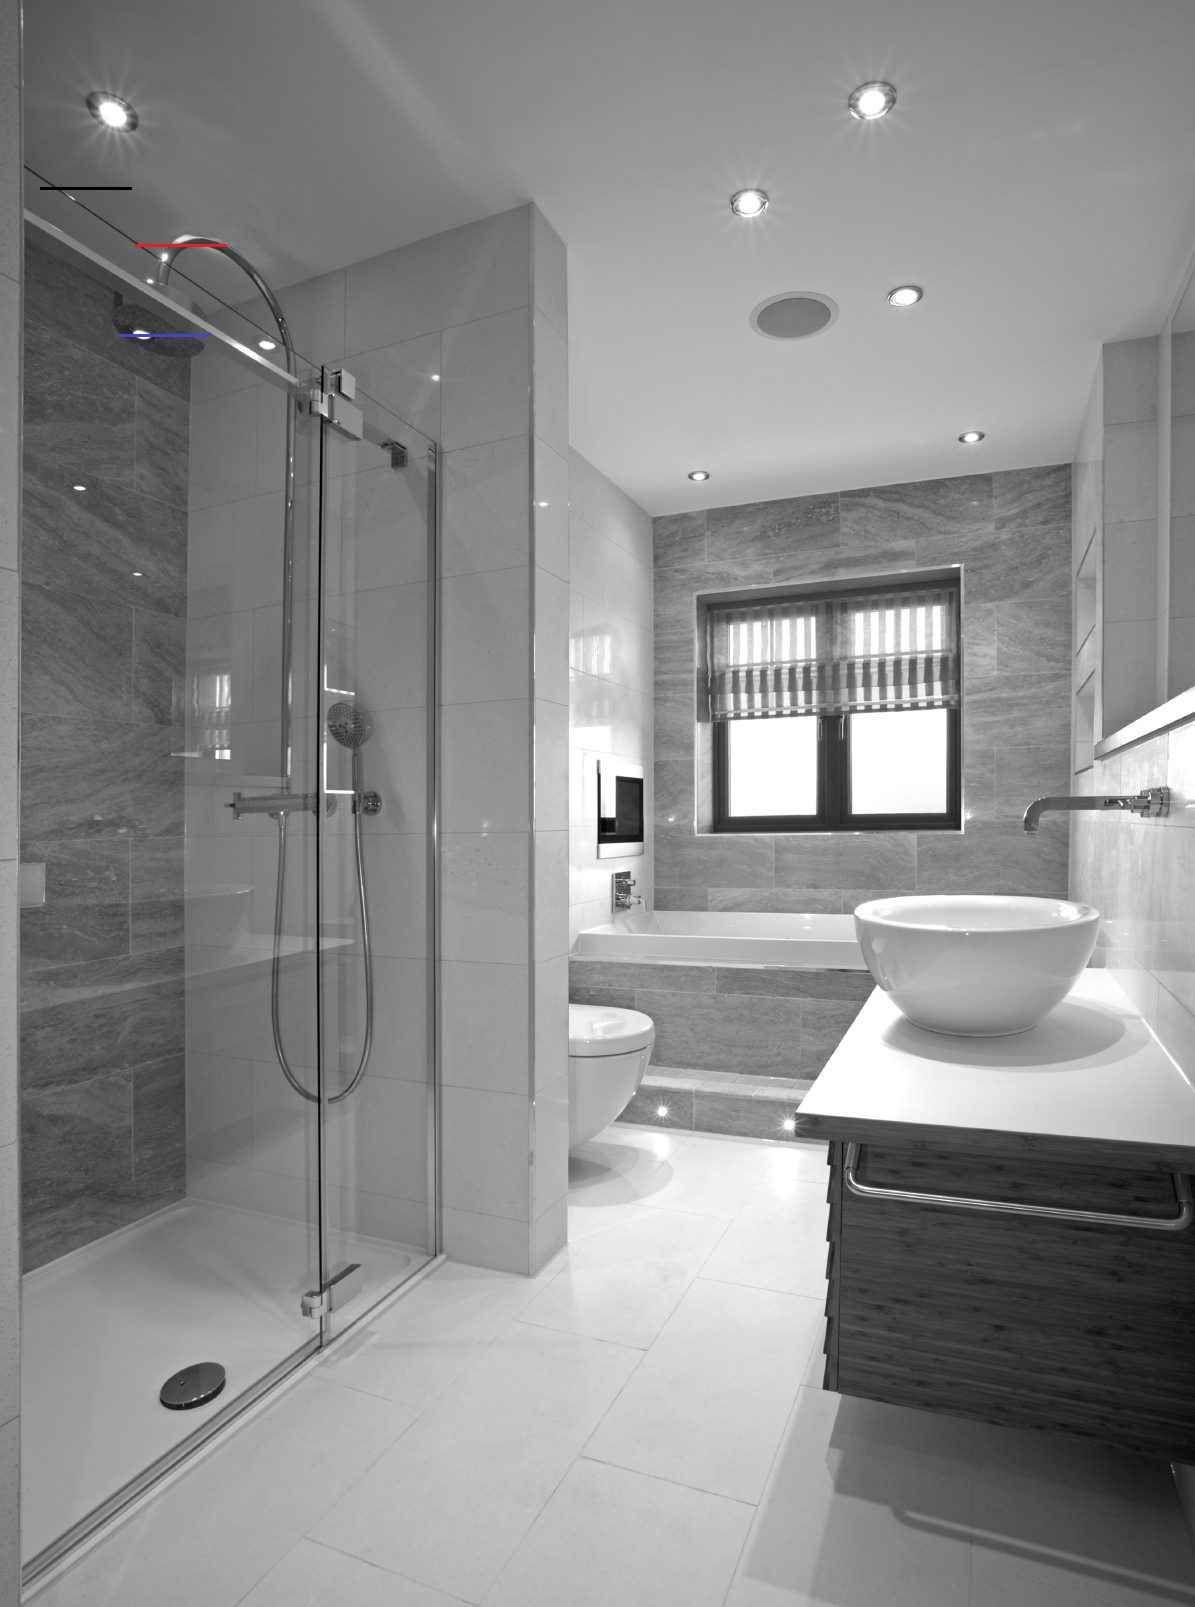 50 Sleek Modern Master Bathroom Ideas Photos In 2020 Modern Master Bathroom Bathroom Inspiration Modern Bathroom Color Schemes